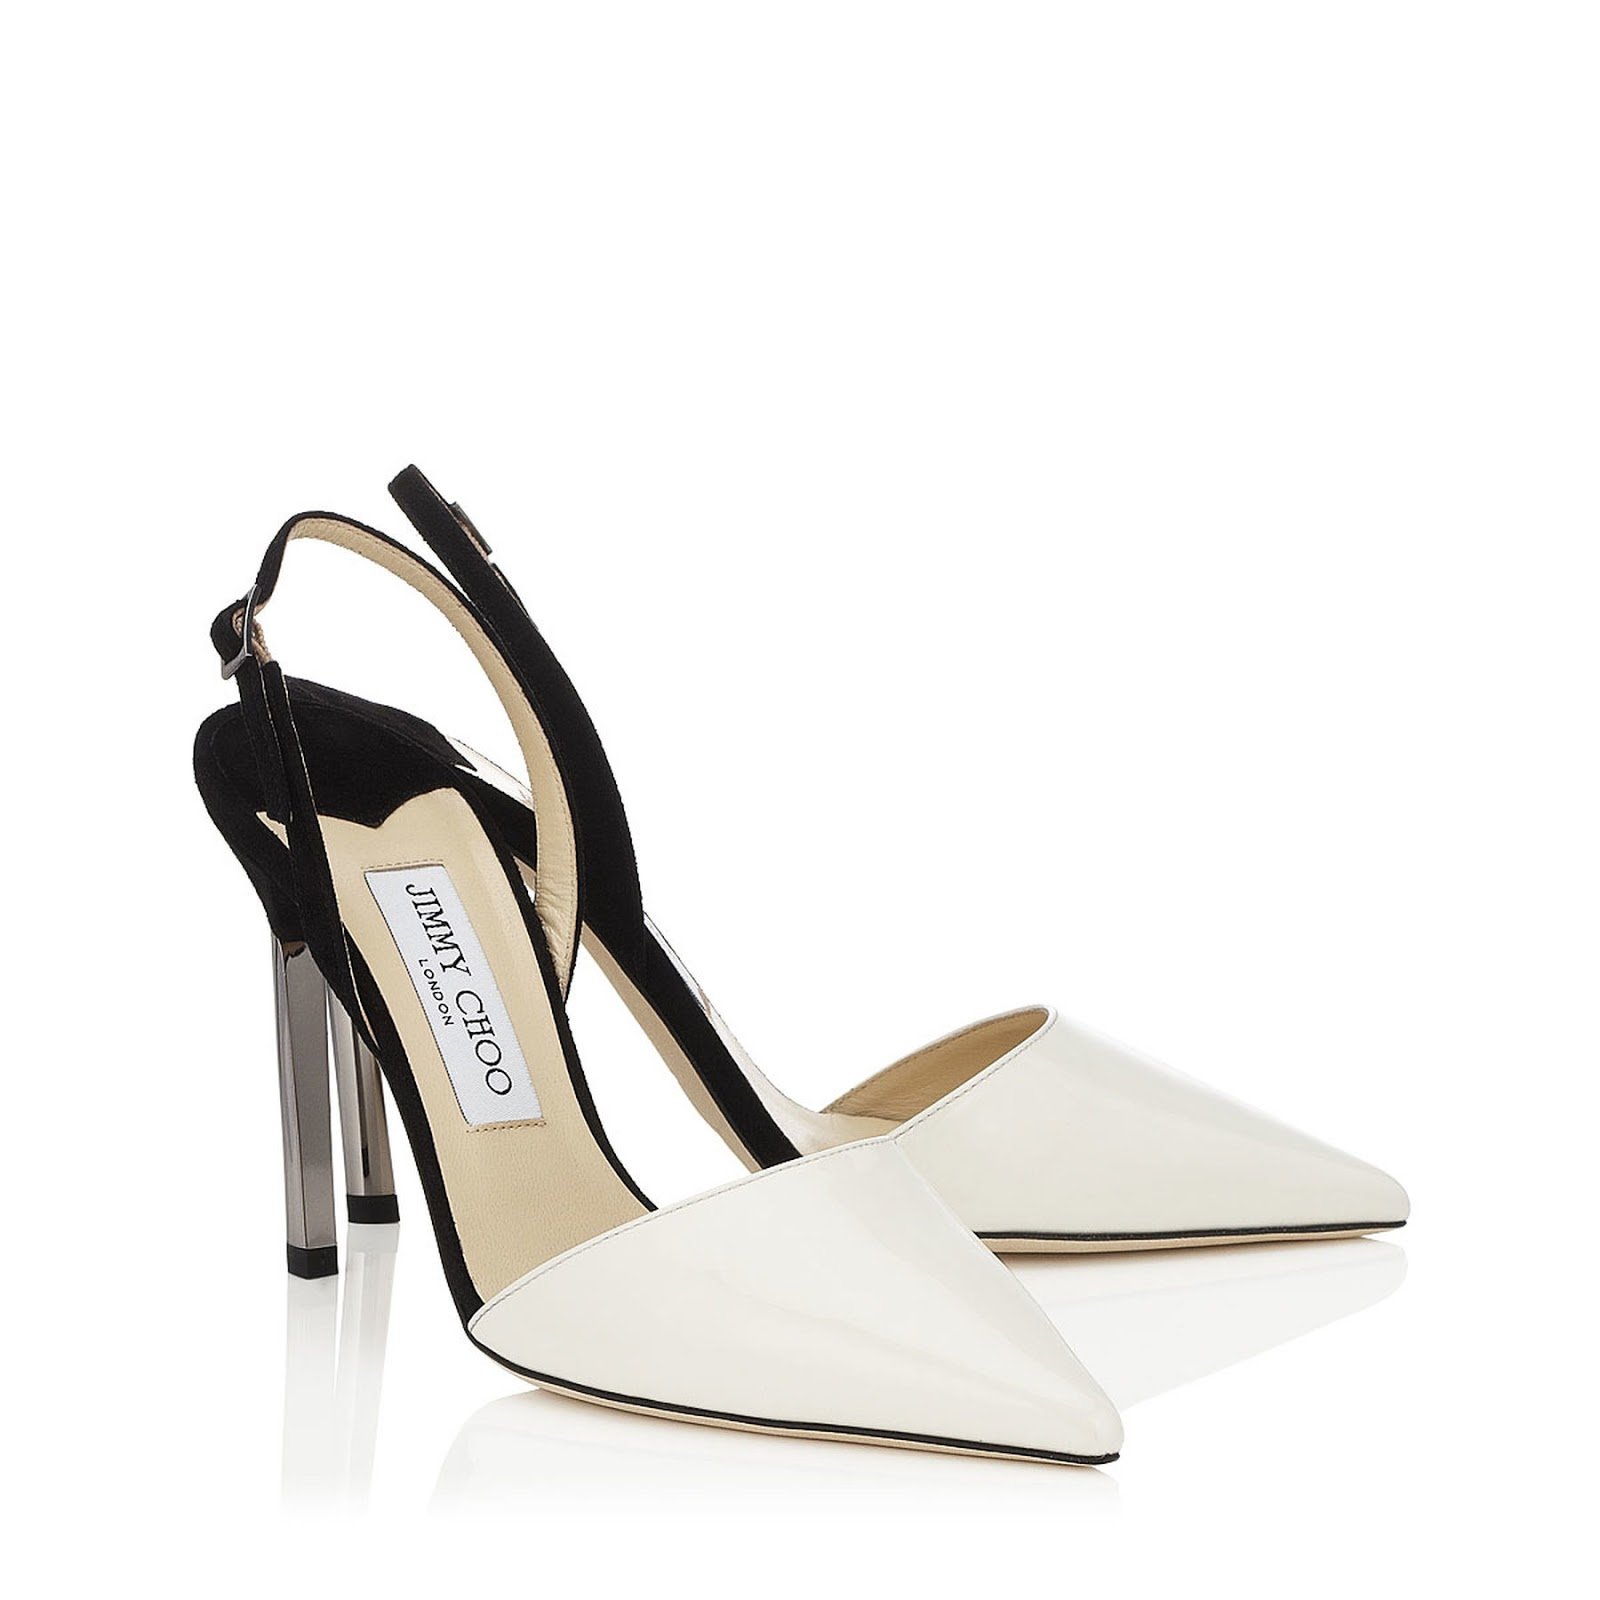 9fa466e1e5b JIMMY CHOO DAVLEEN OFF WHITE PATENT & BLACK SUEDE - Reed Fashion Blog